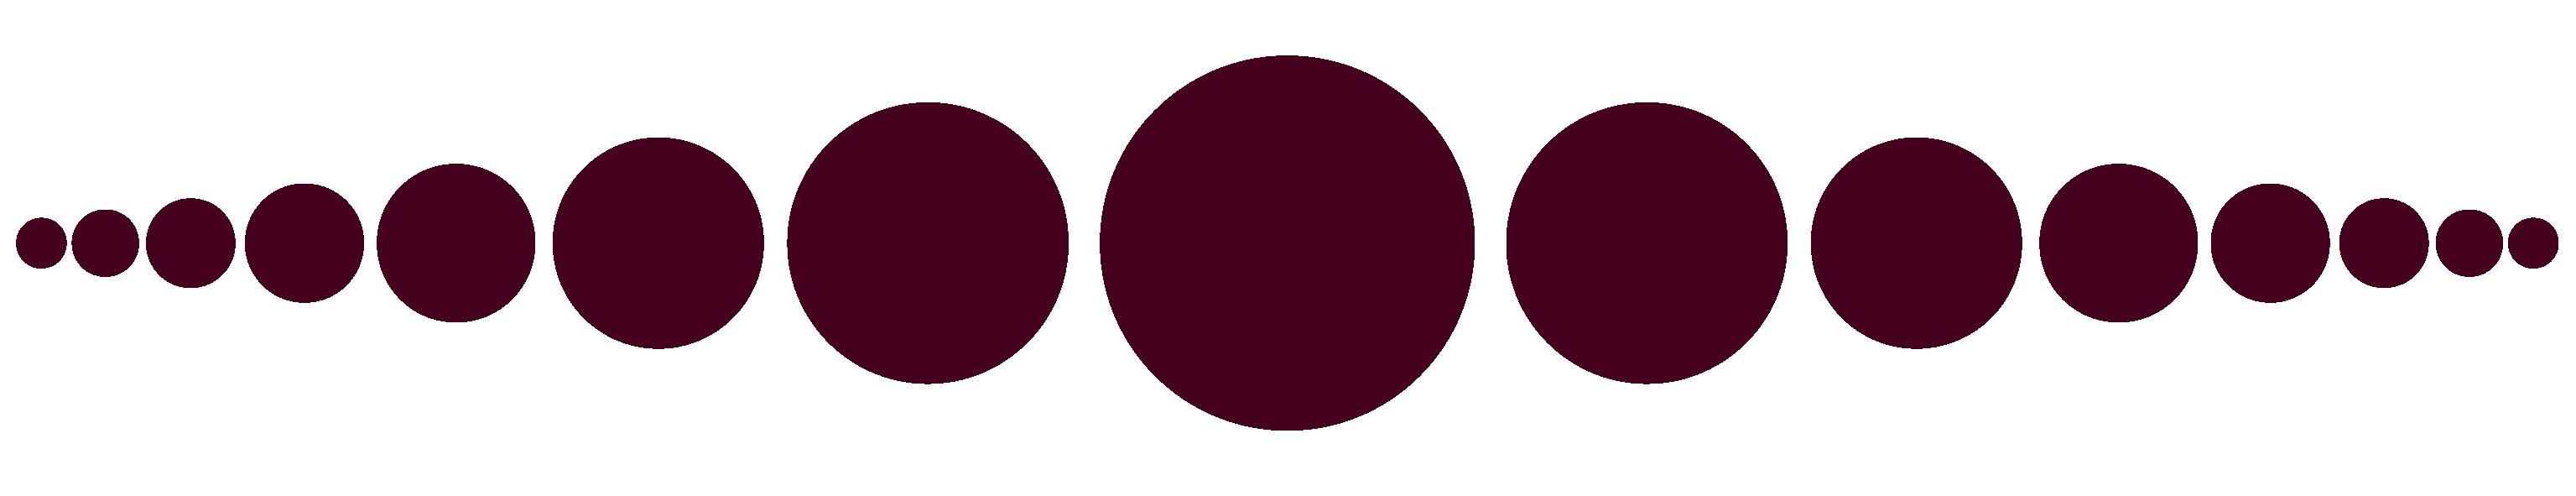 separator-02